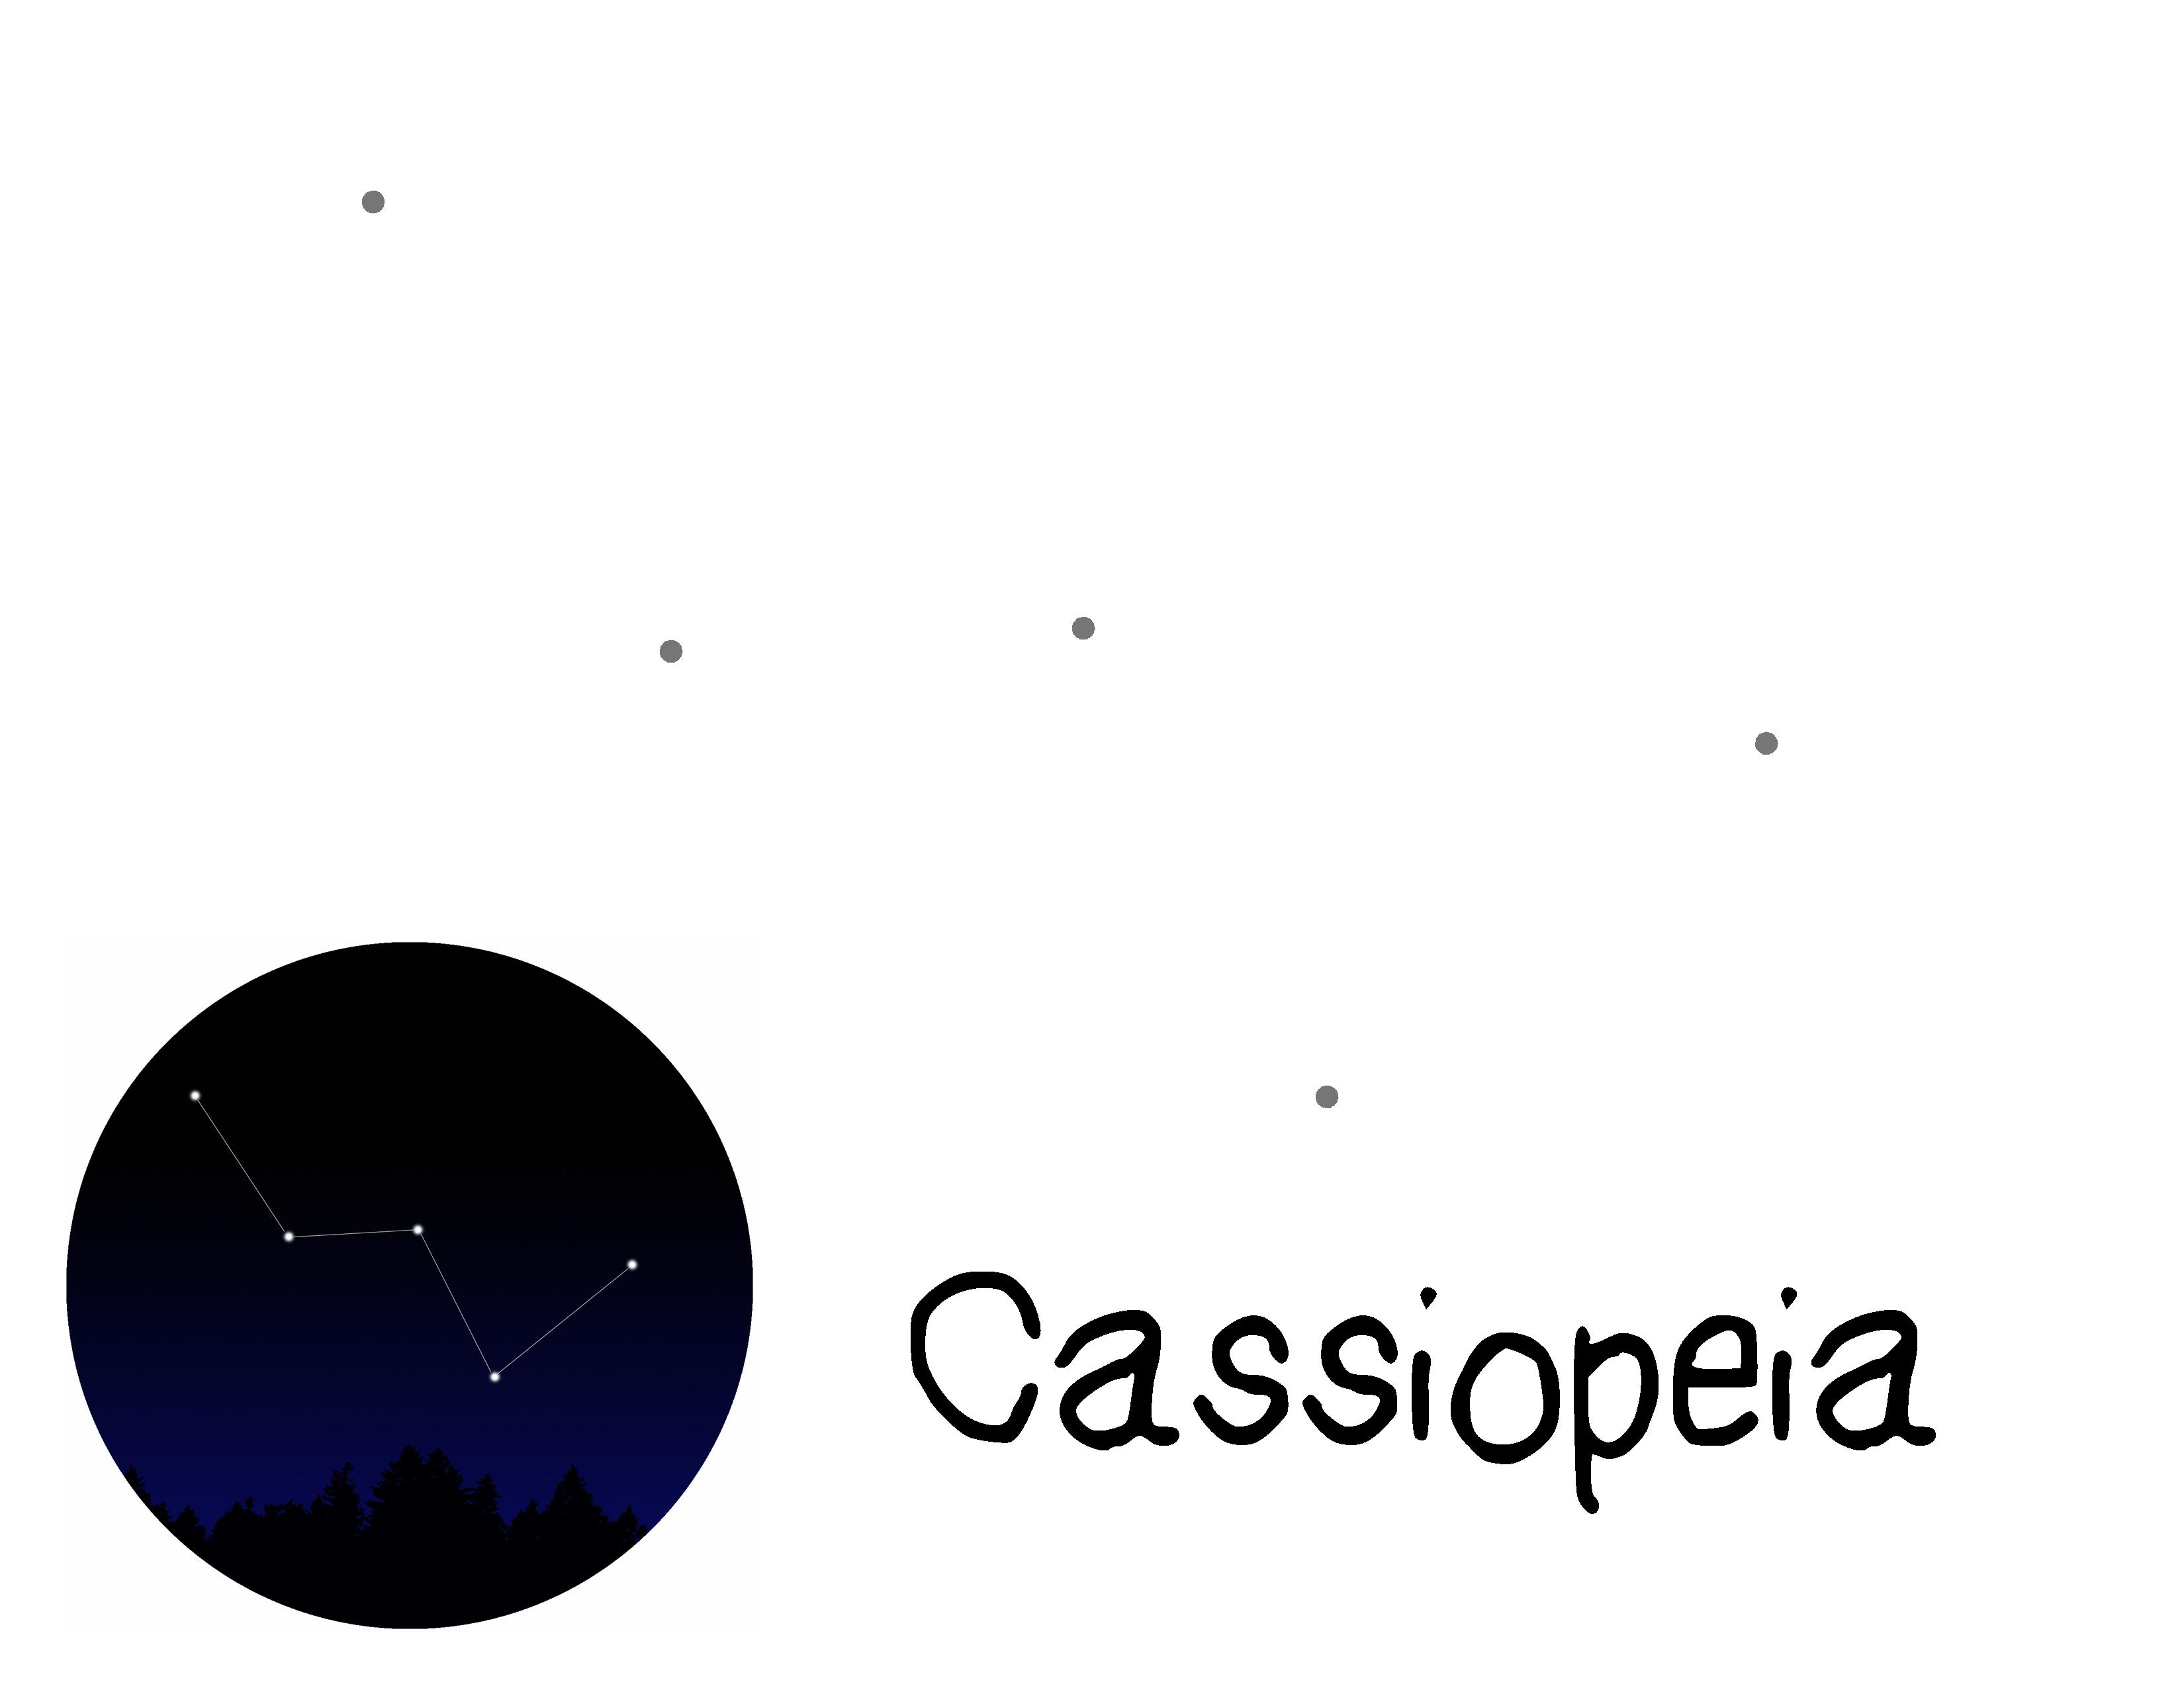 Cassiopeia Worksheet